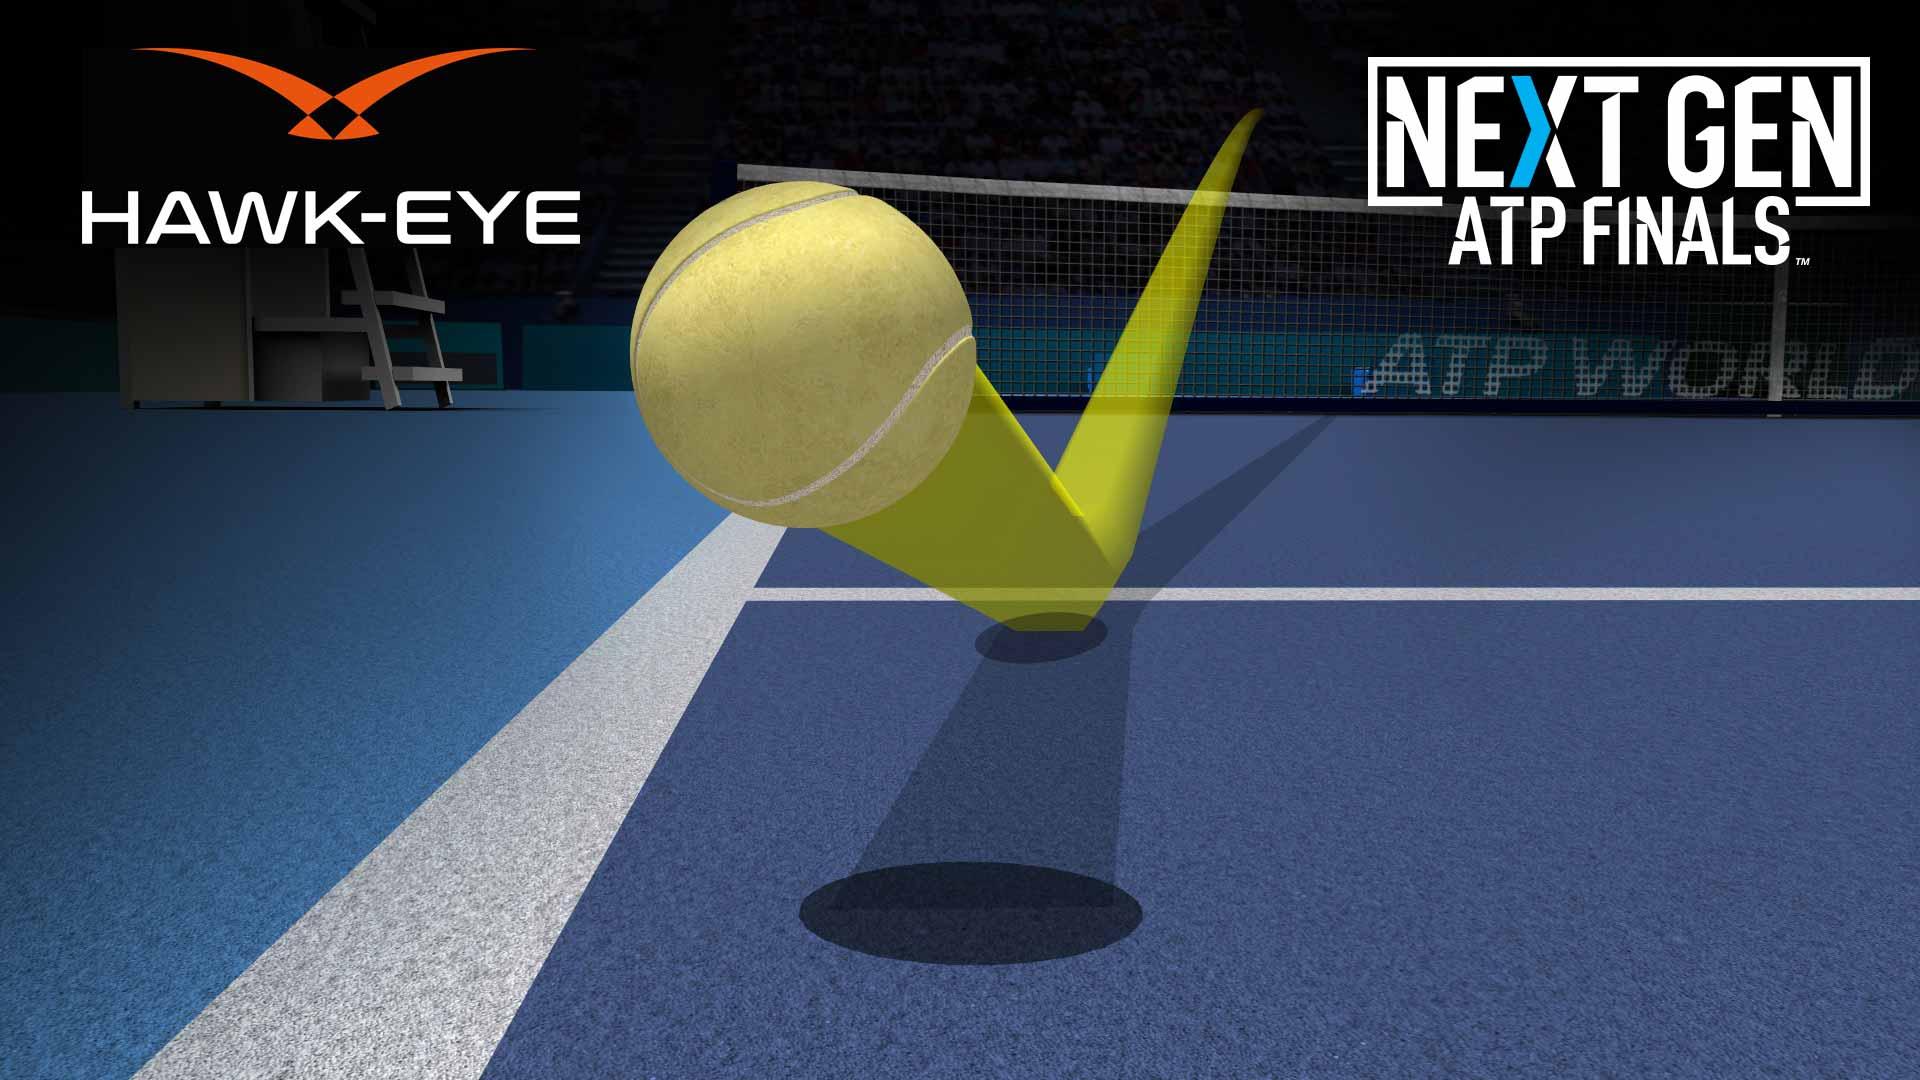 Tennis en ligne rencontres